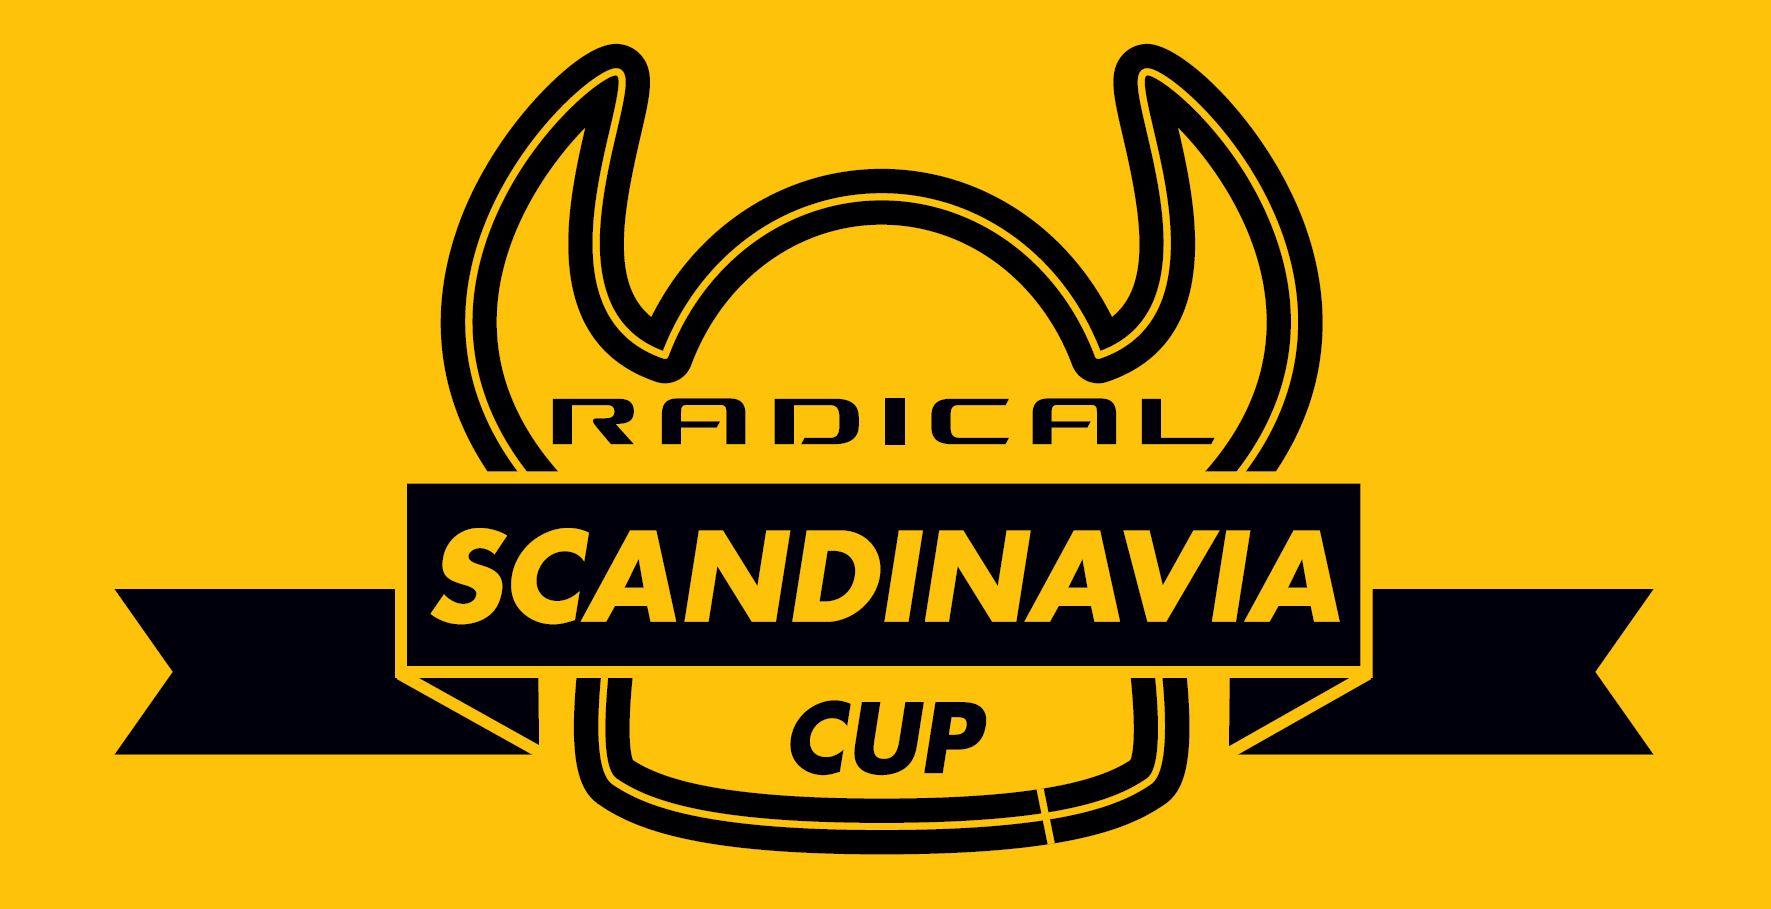 Radical Cup Scandinavia LOGO.JPG